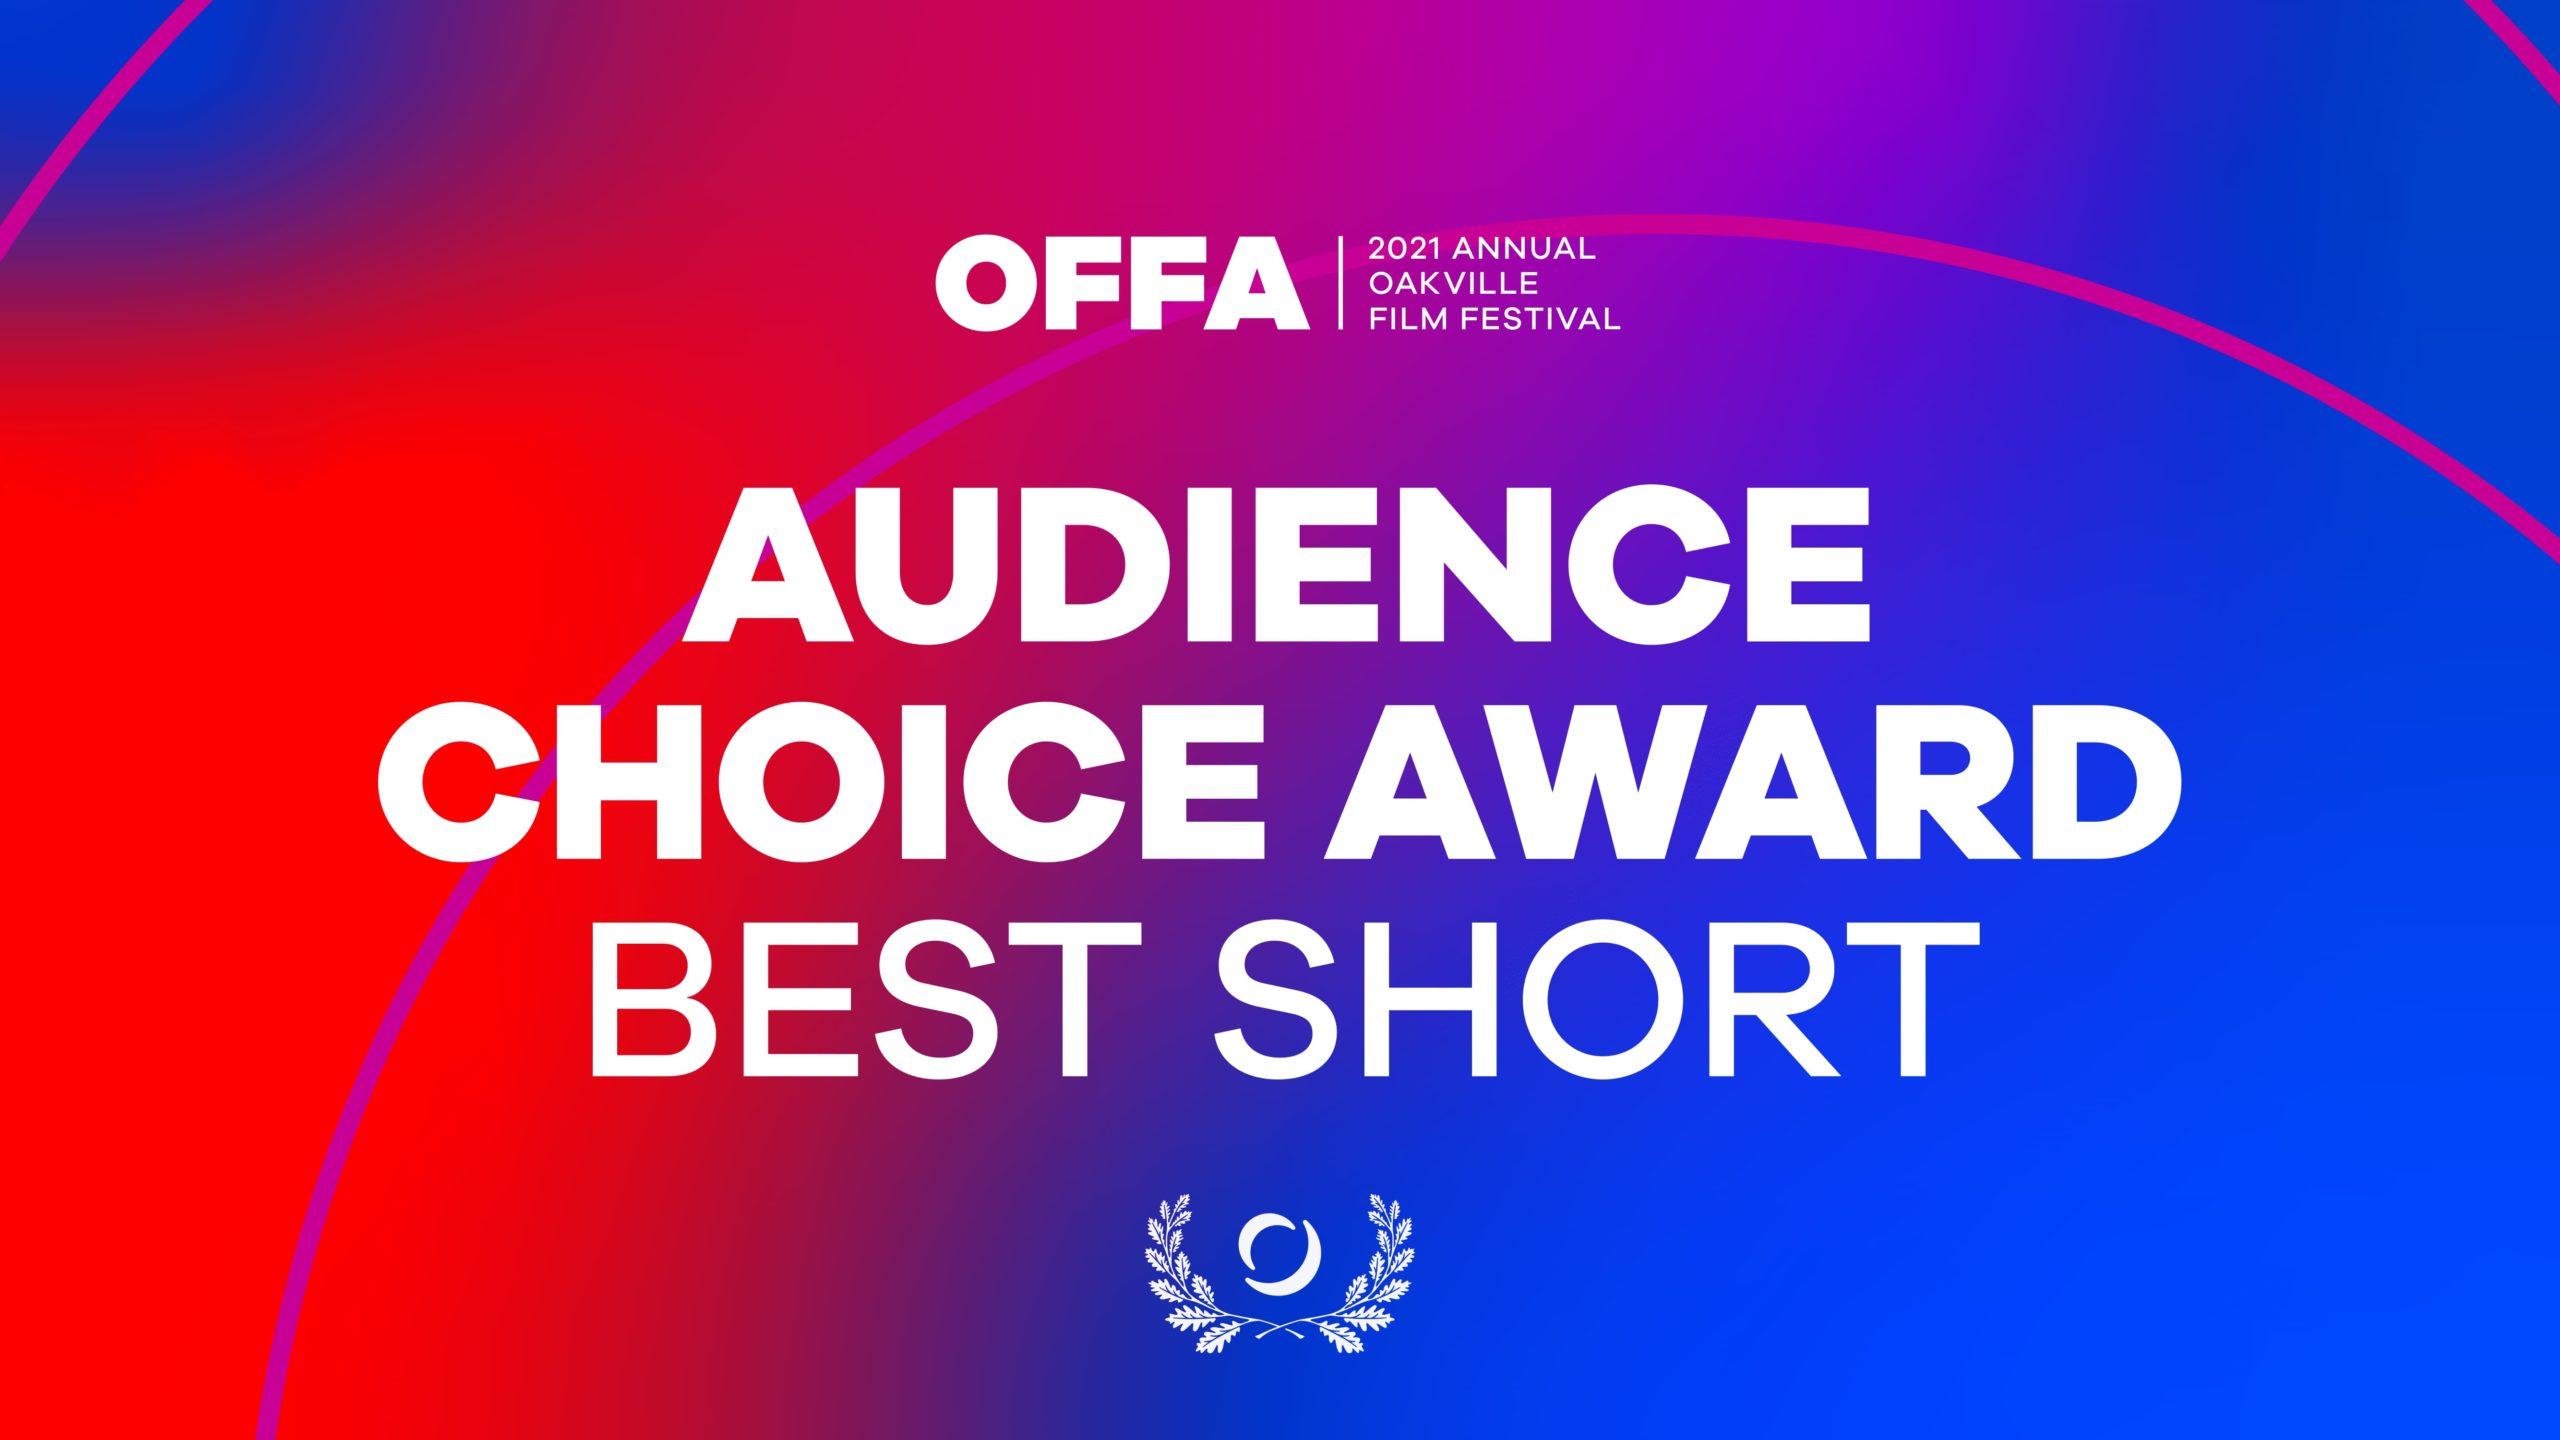 OFFA 2021 Audience Choice Award Best Short